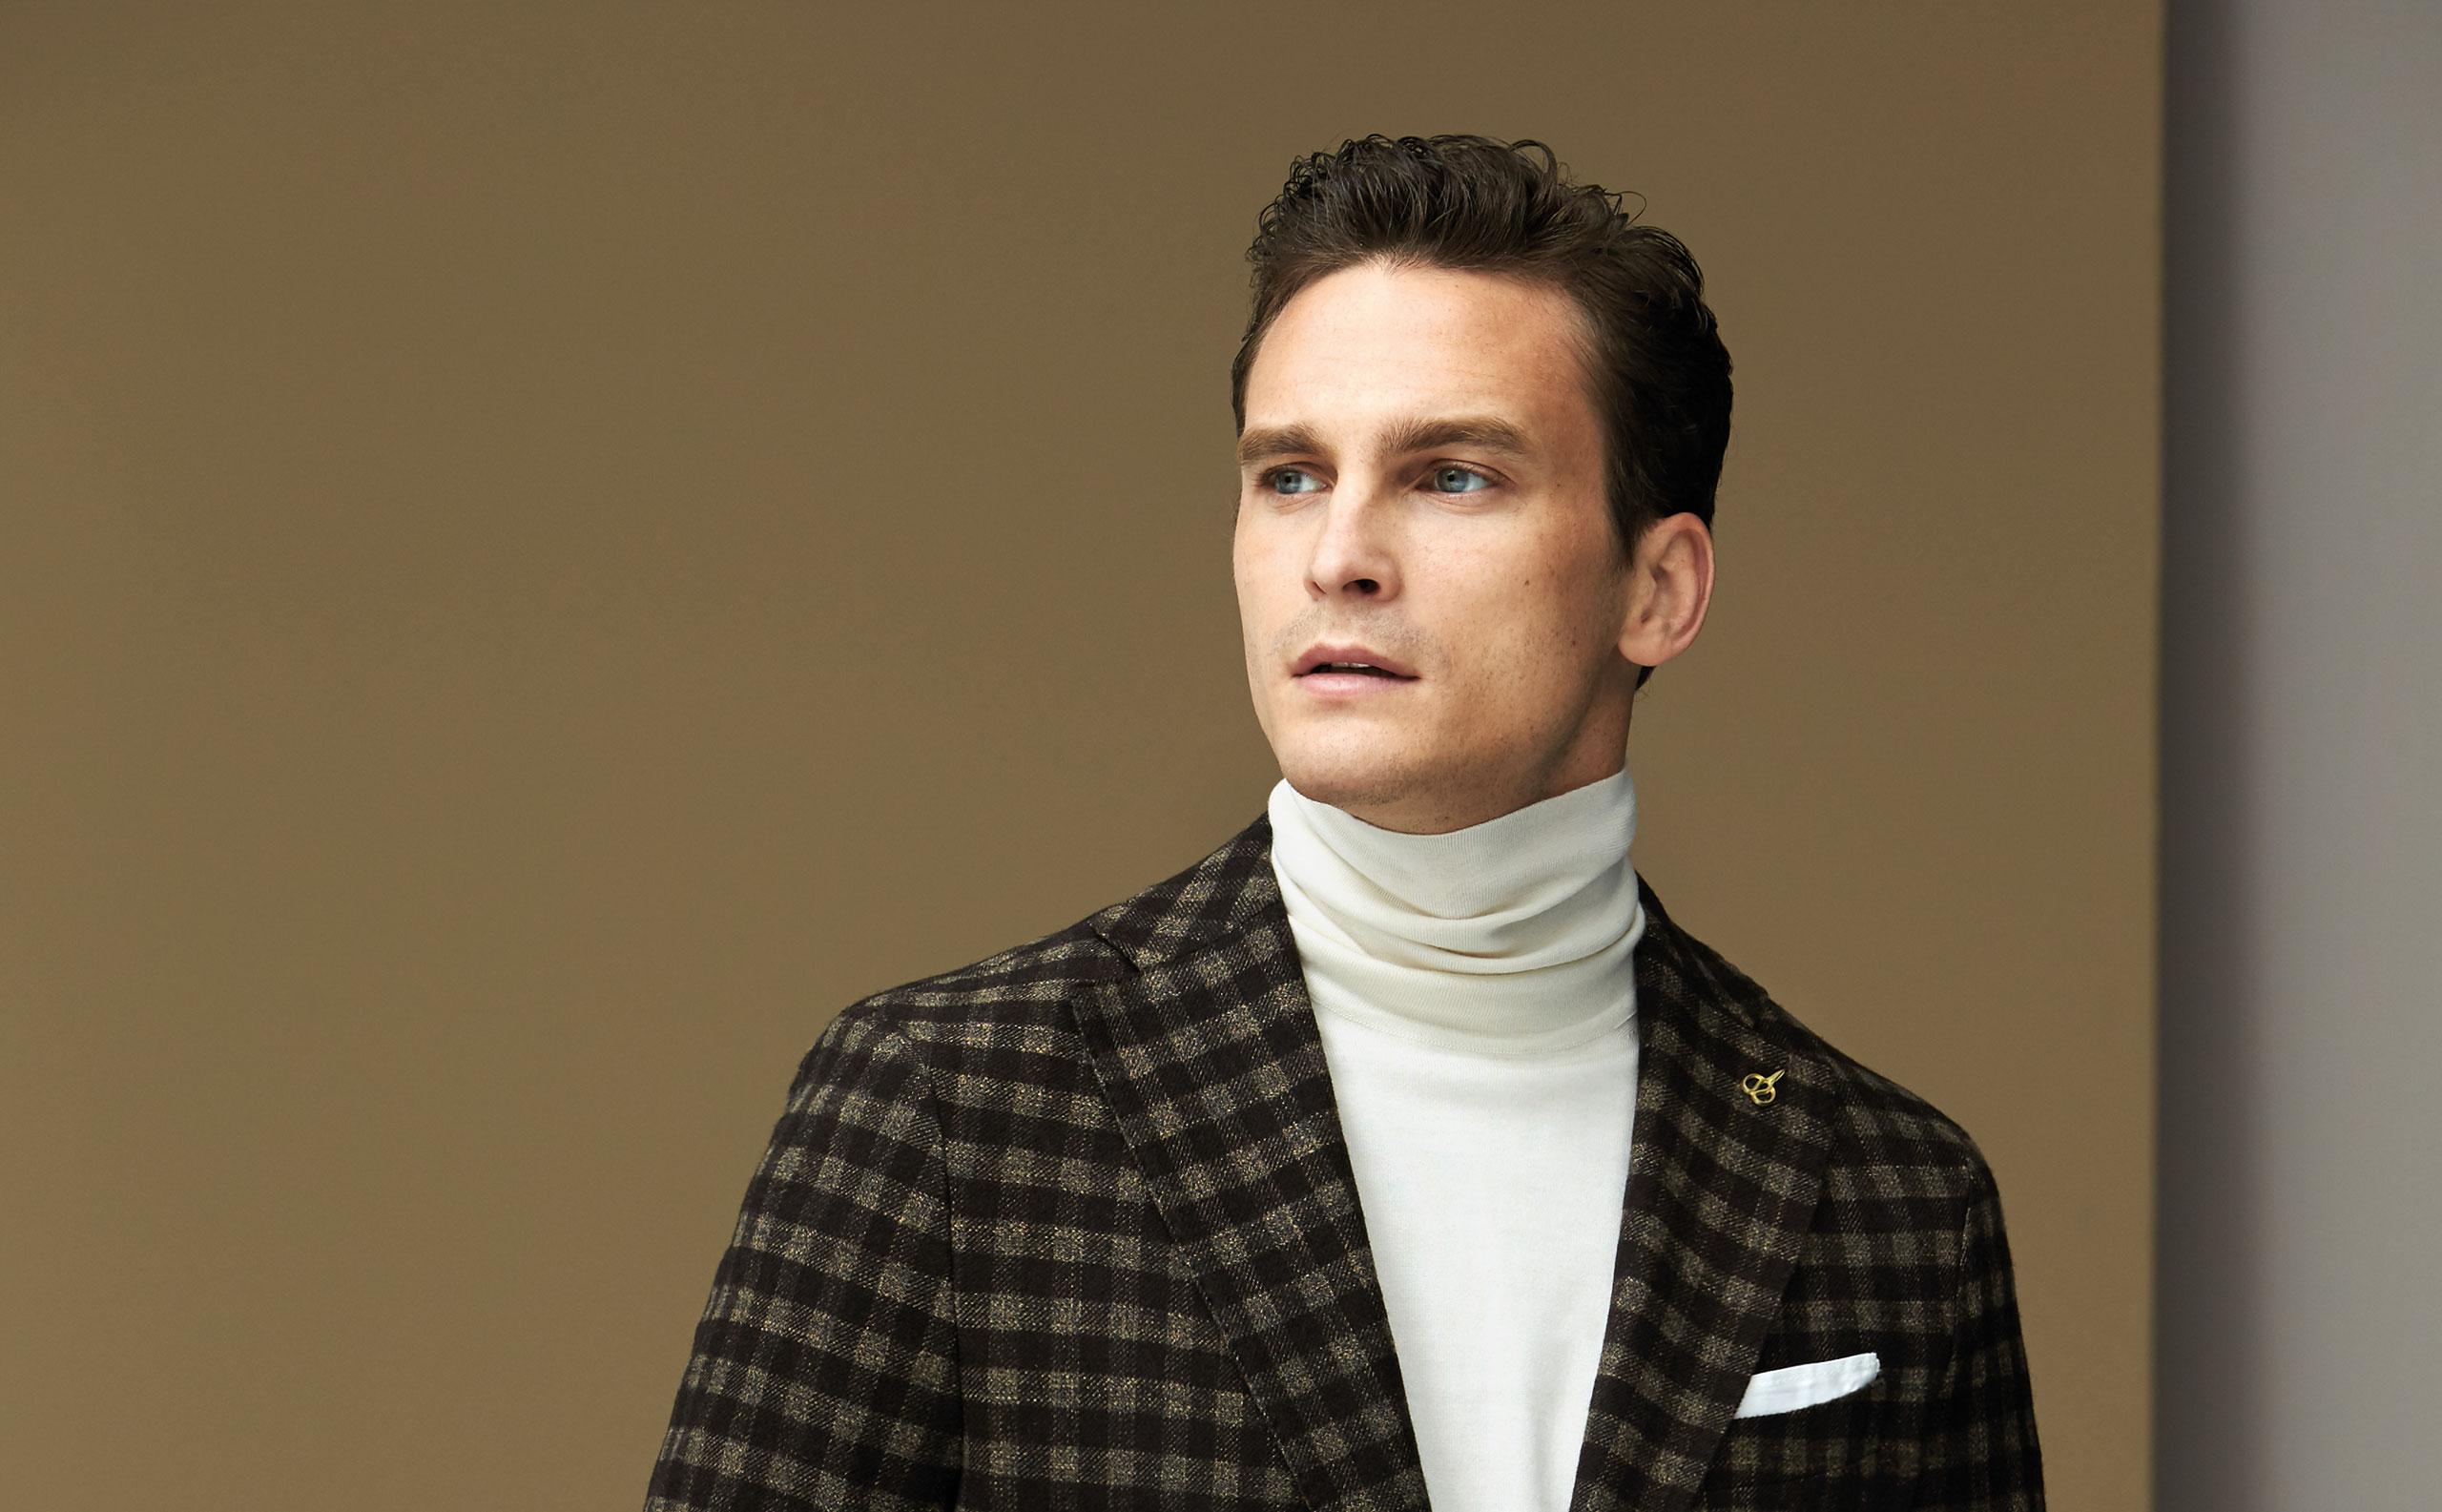 Abbigliamento Uomo A/I 2018